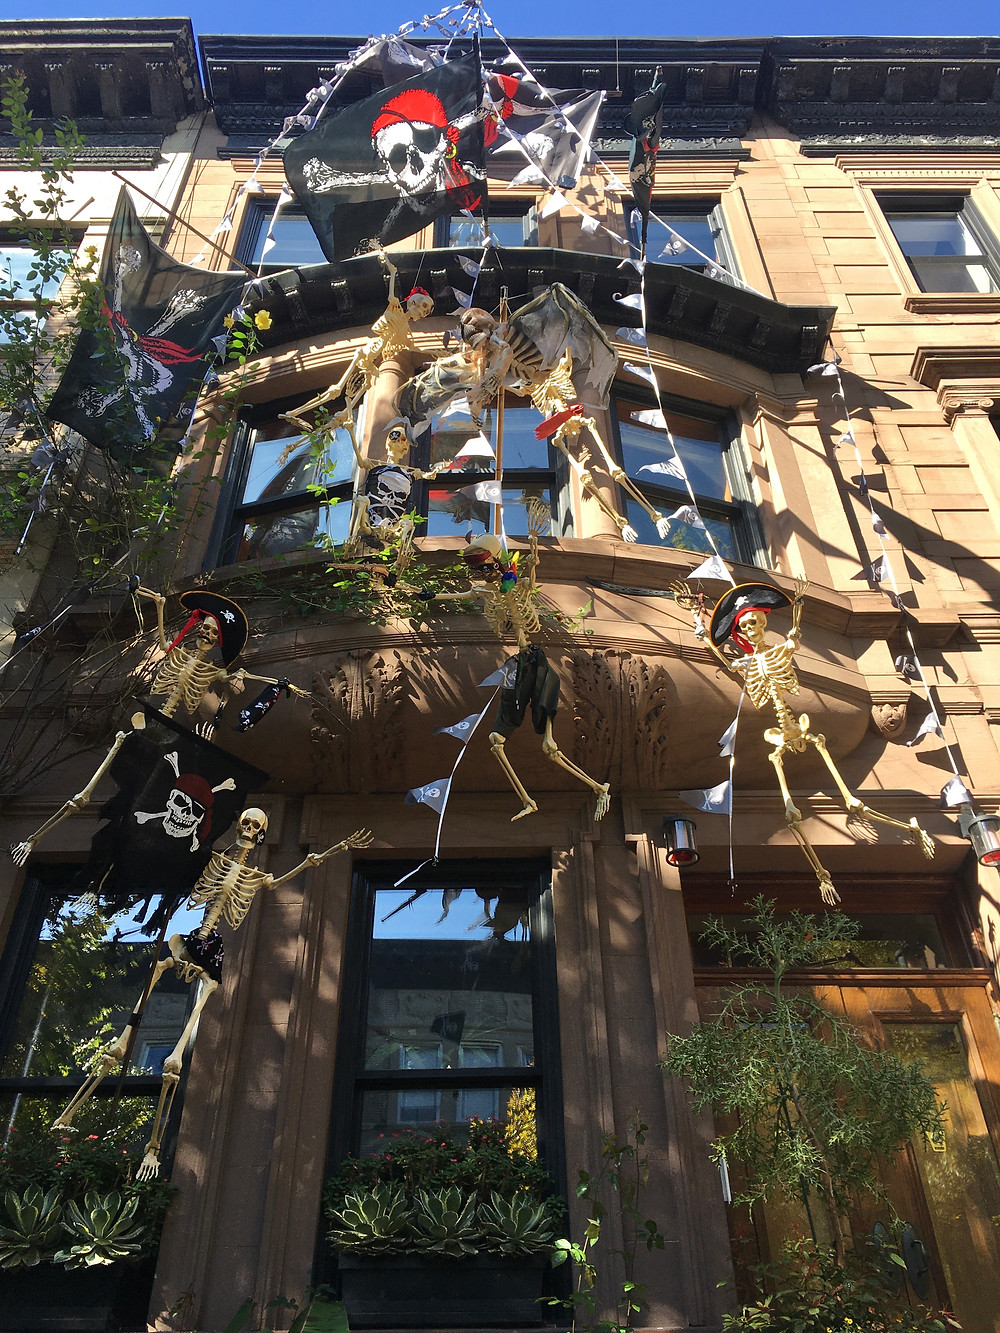 Skeleton pirates have taken over a Hamilton Terrace brownstone